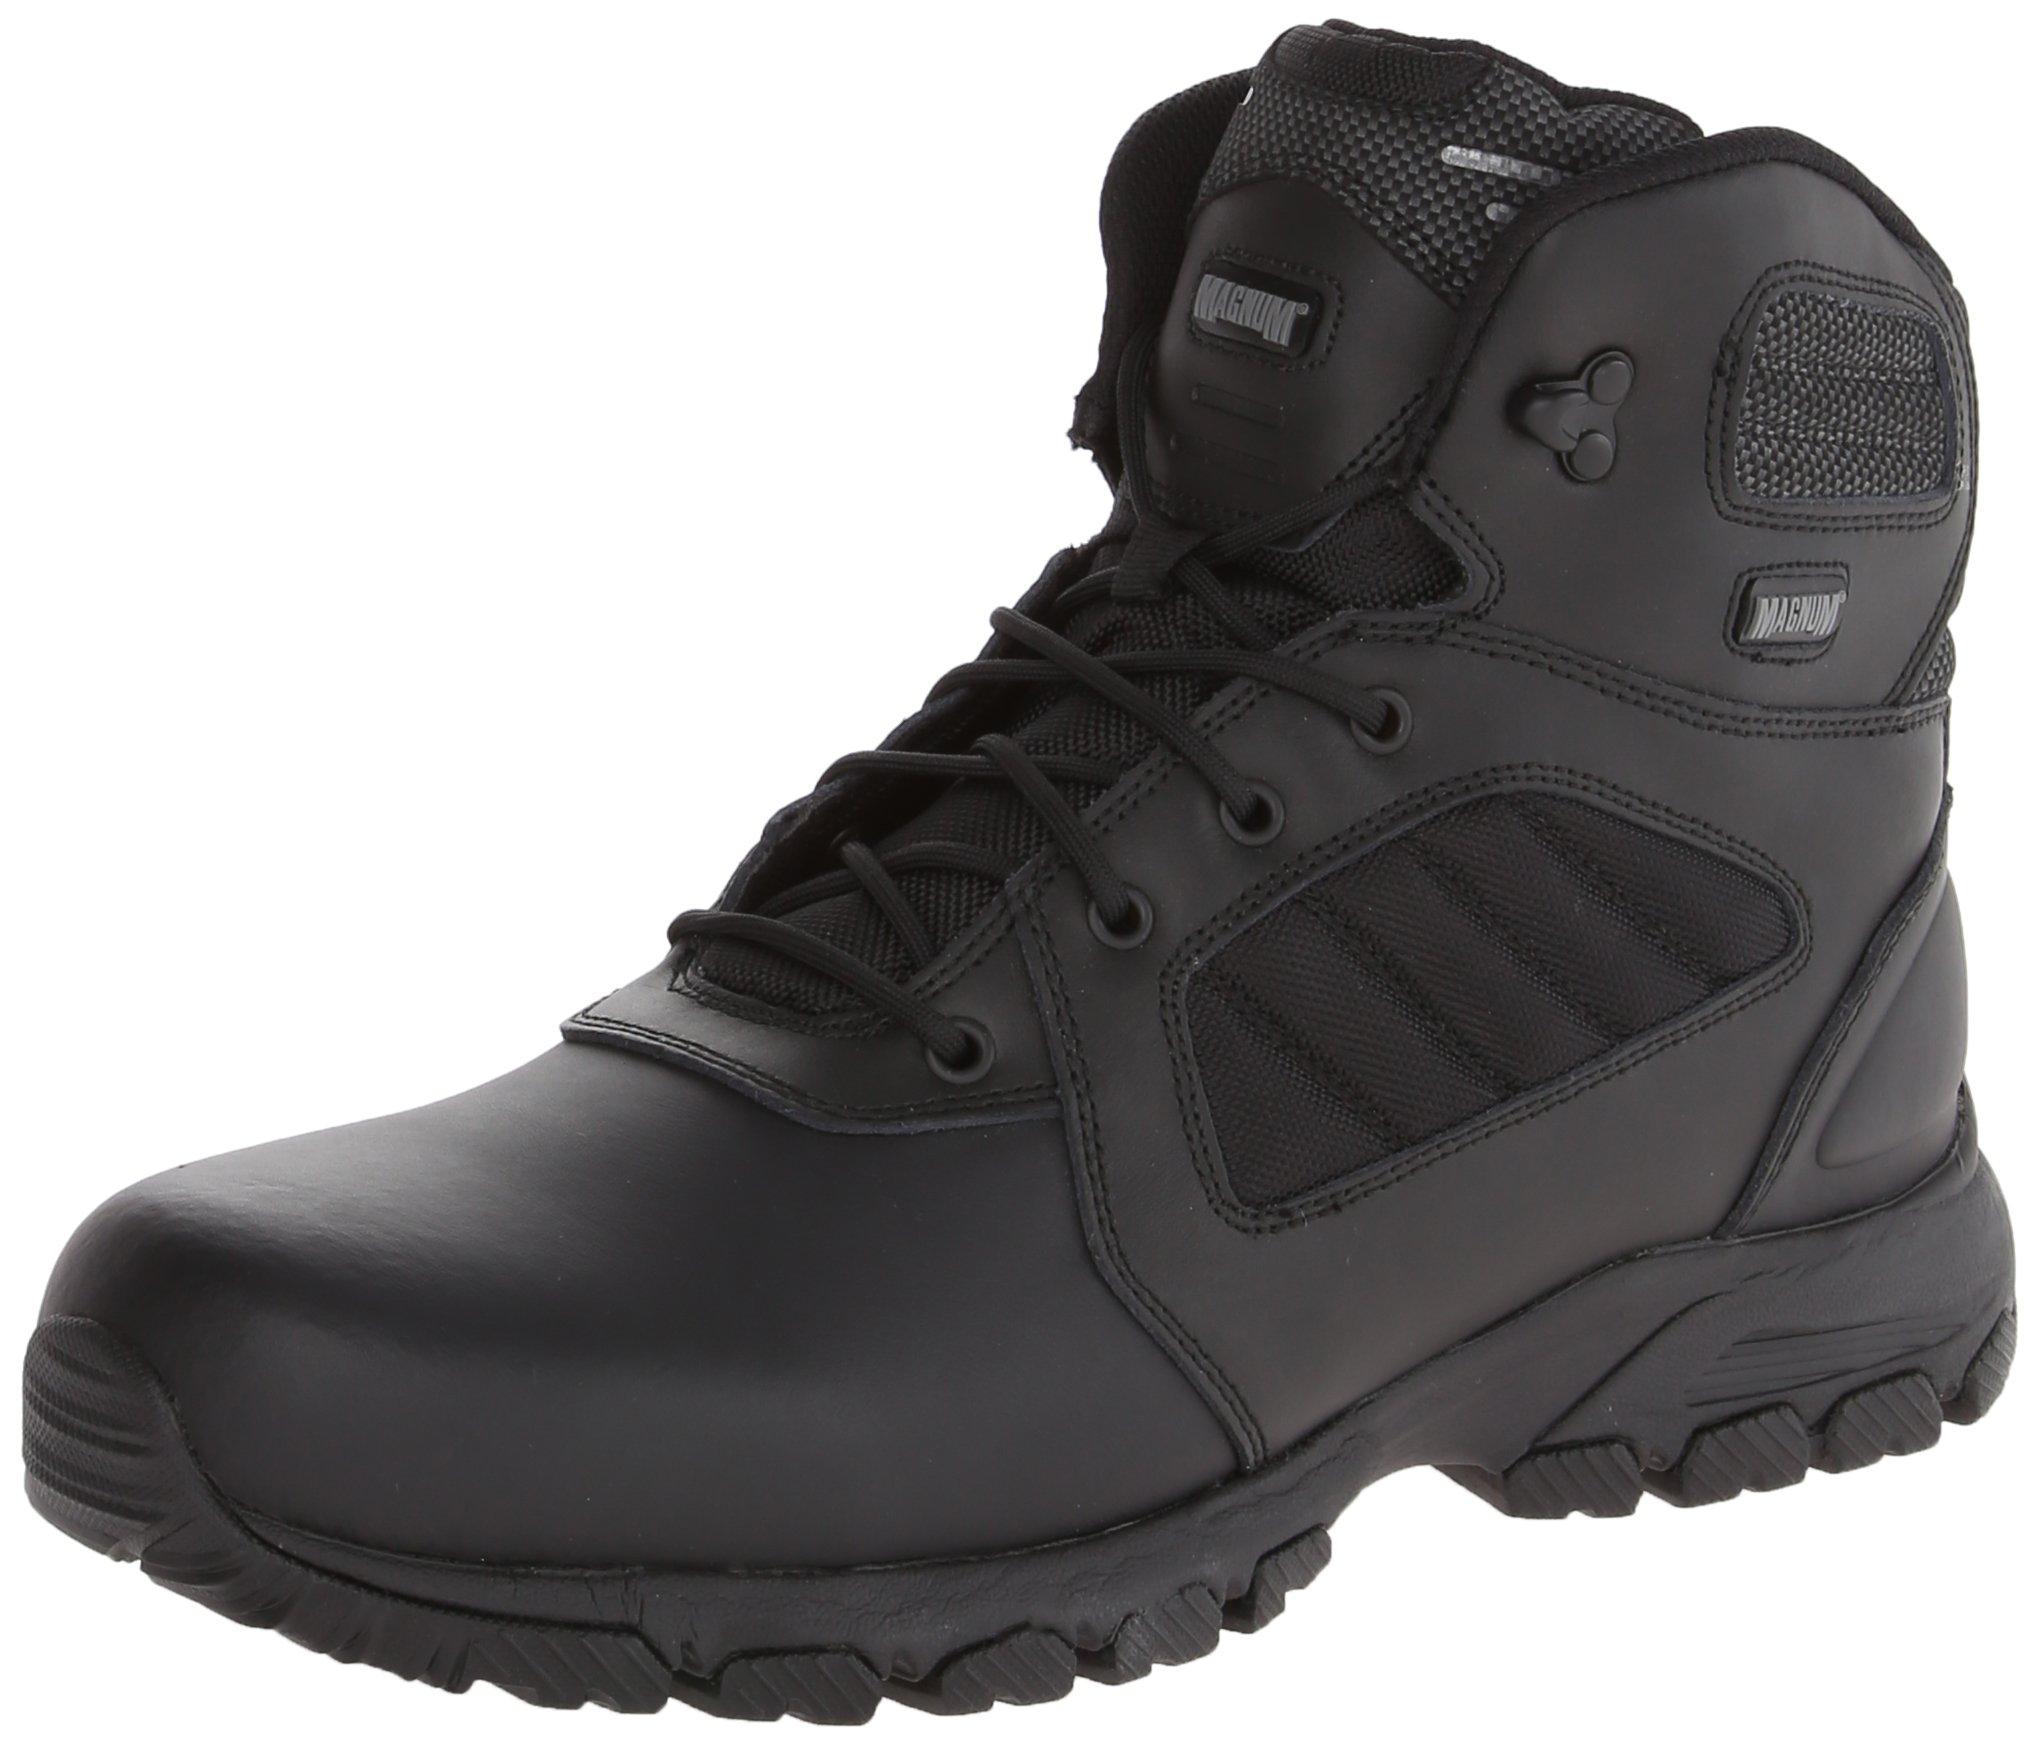 Magnum Men's Response III 6.0 Slip Resistant Work Boot,Black,10.5 W US